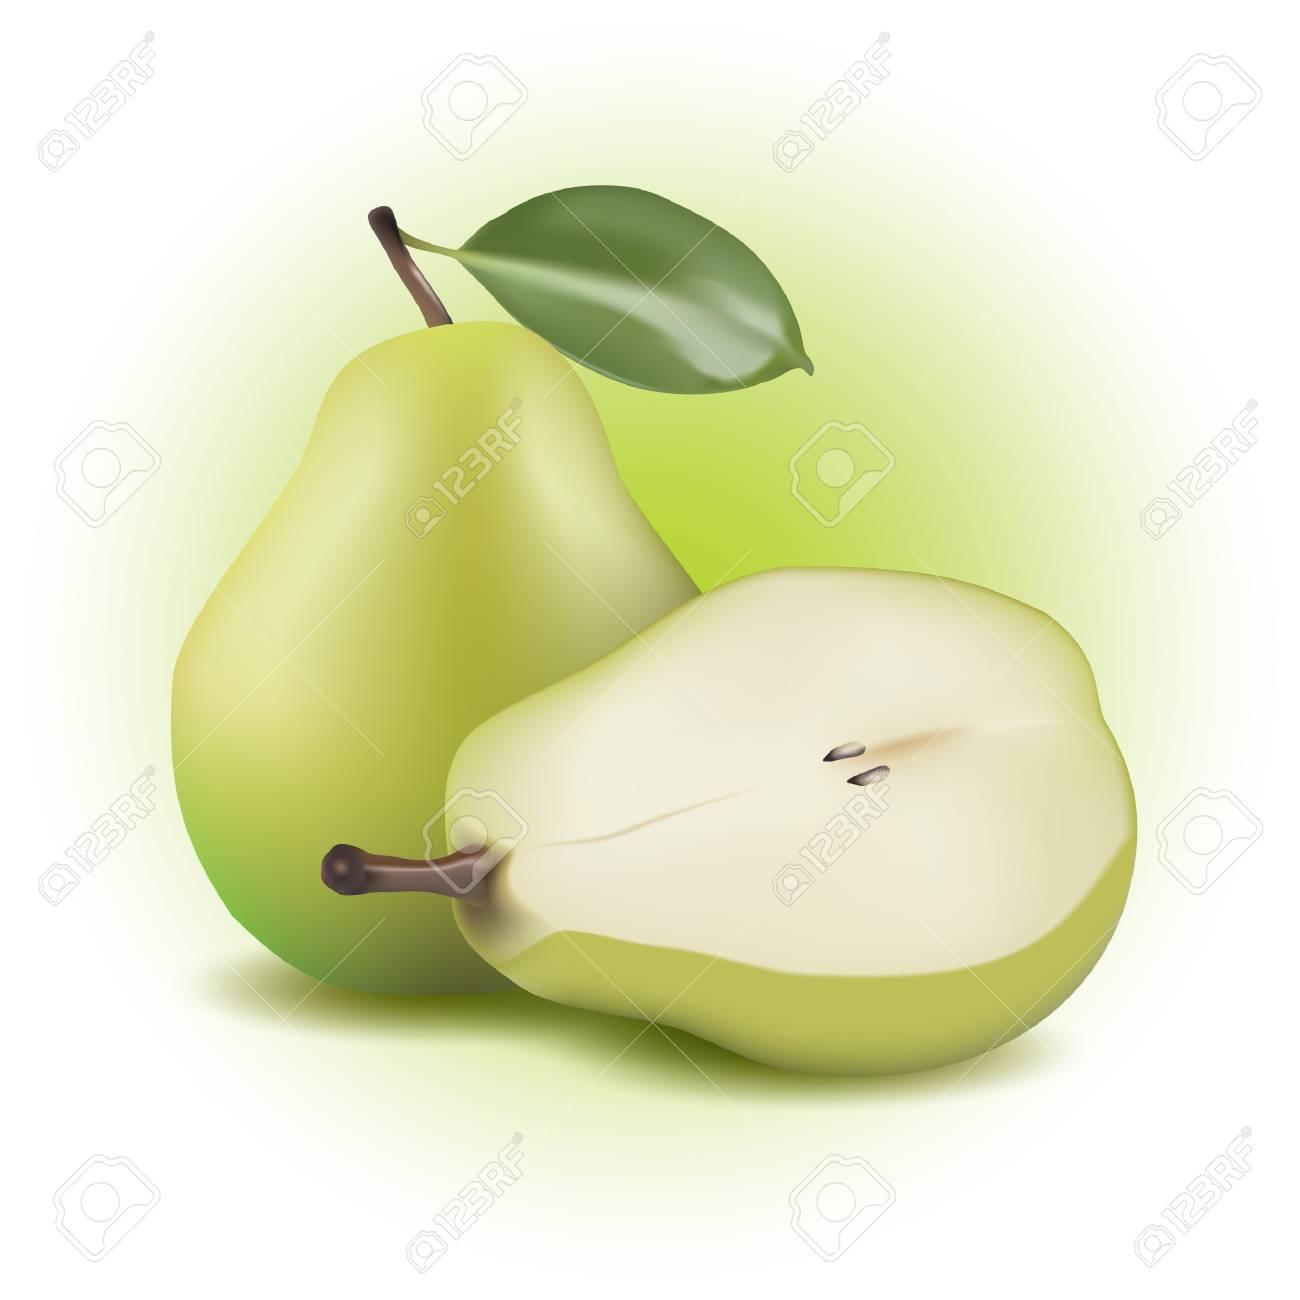 pear - 53889467